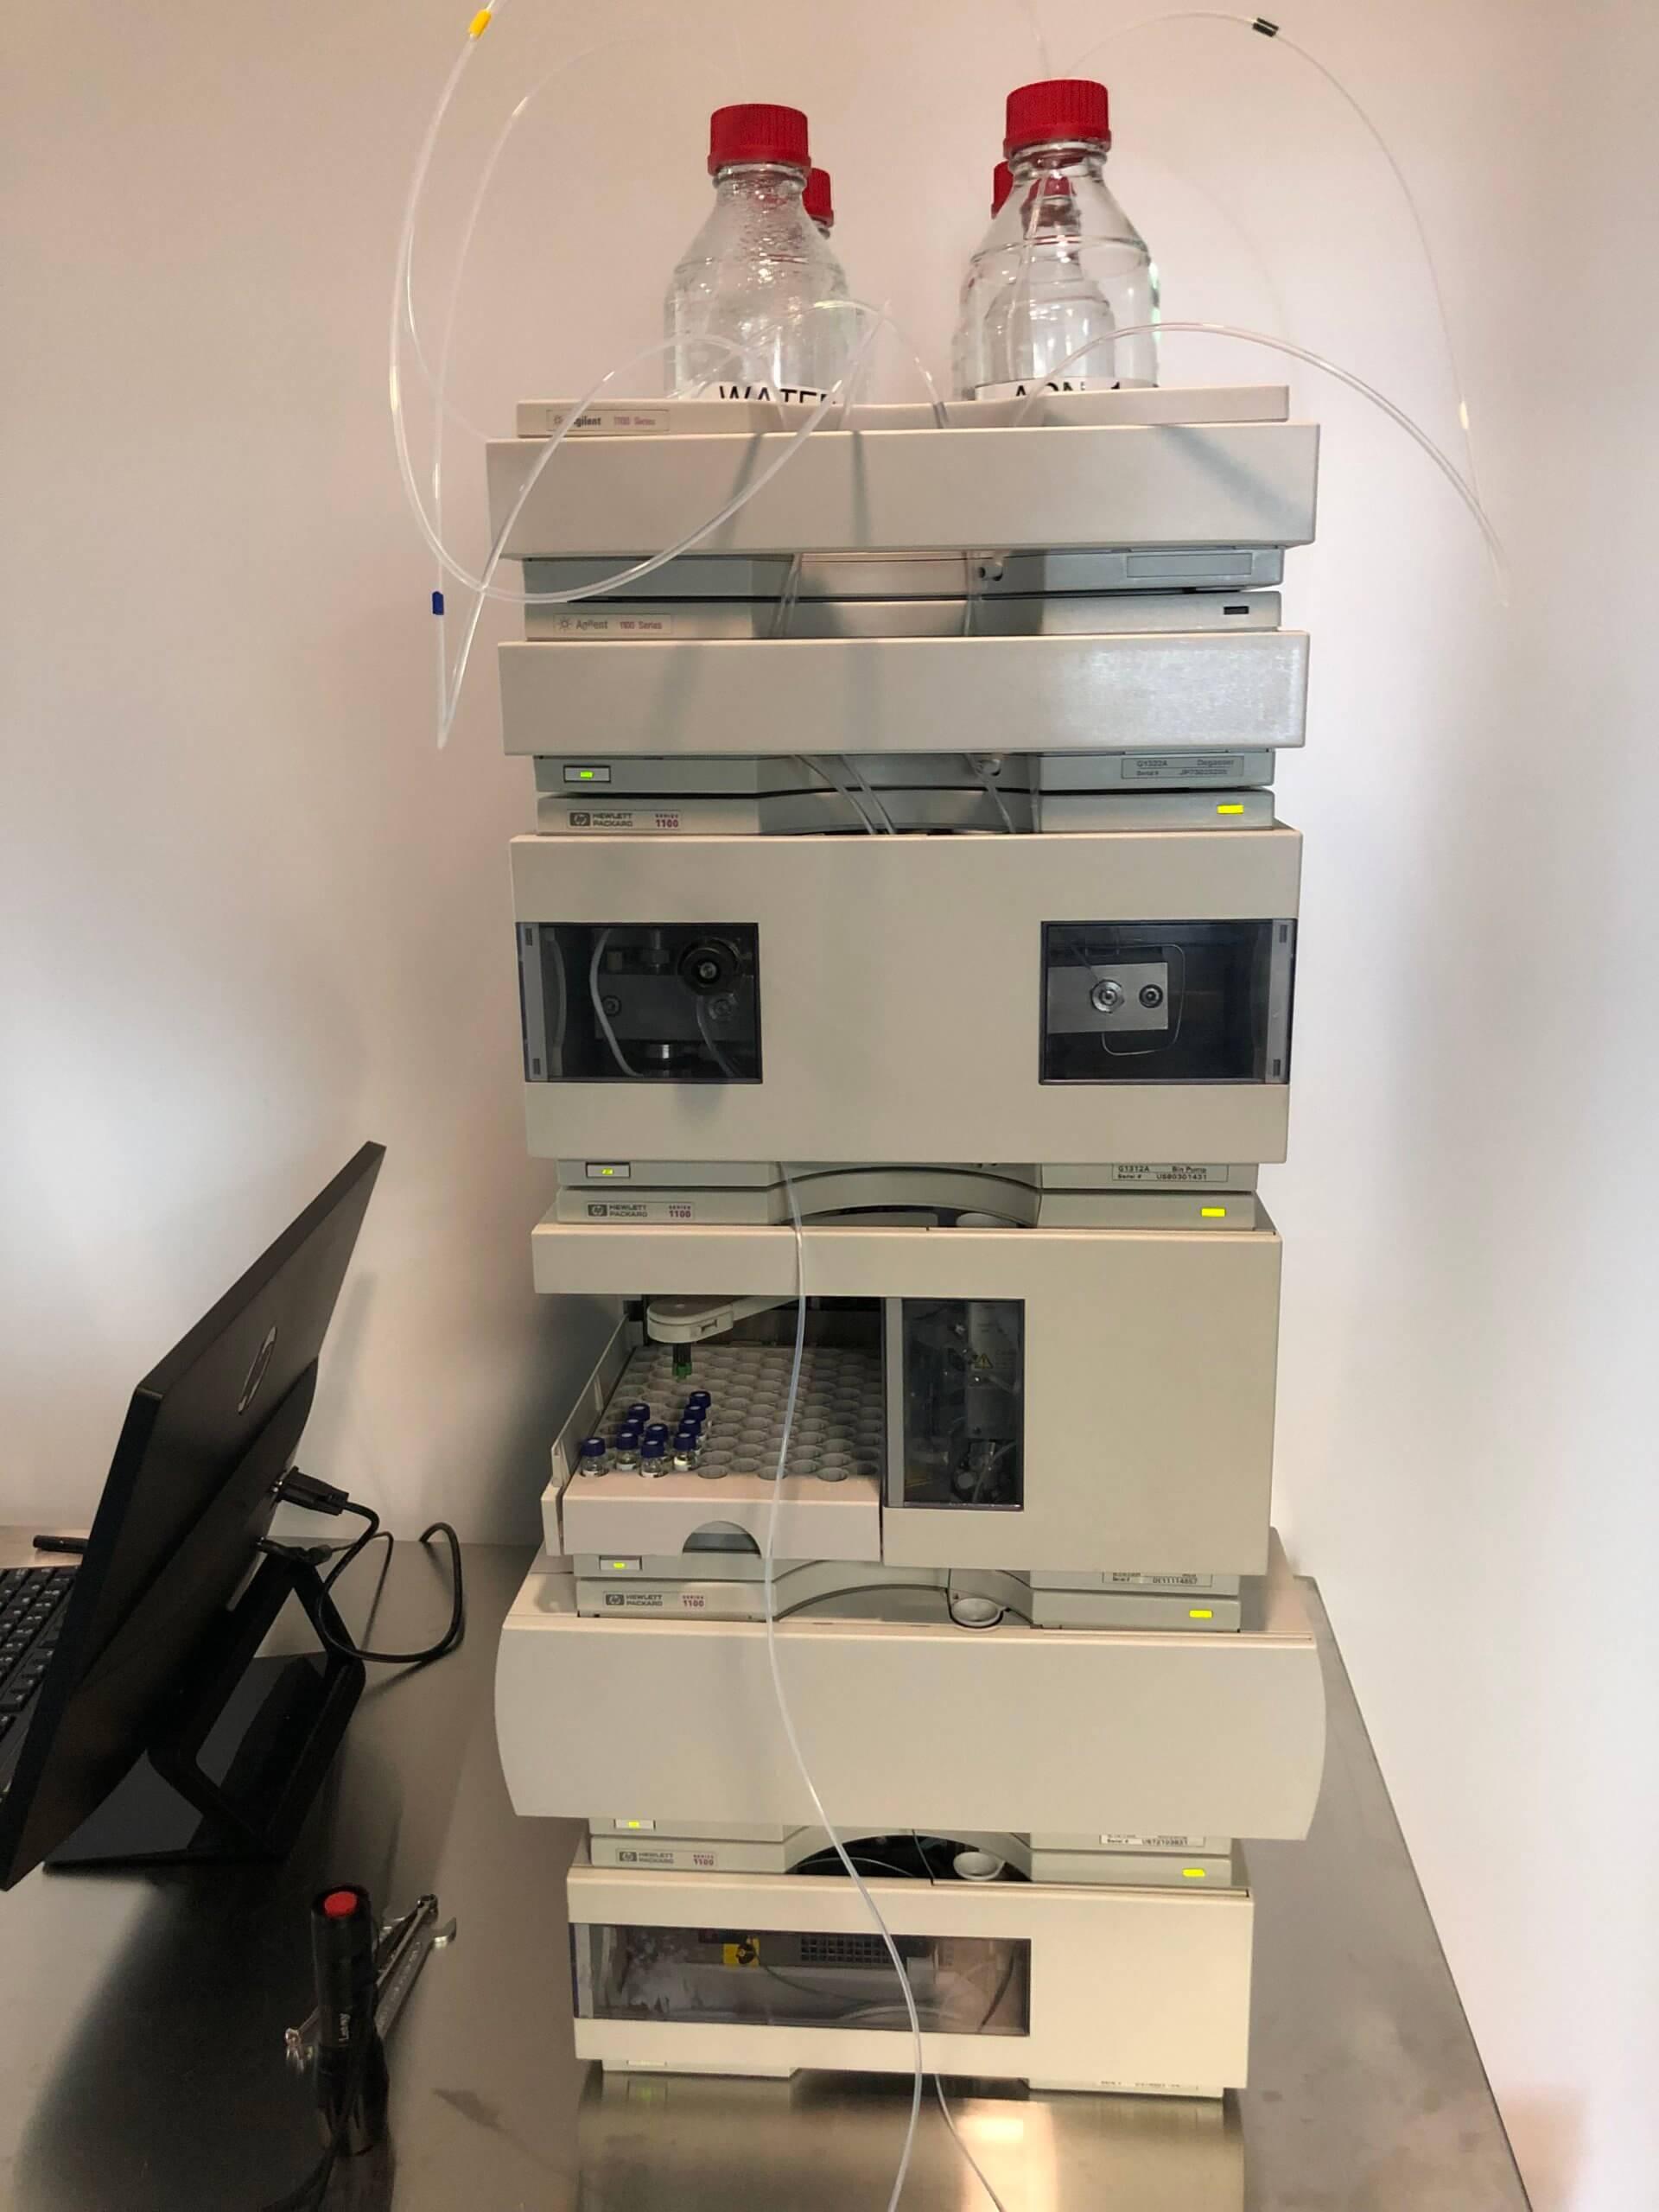 Hemp Potency Testing equipment